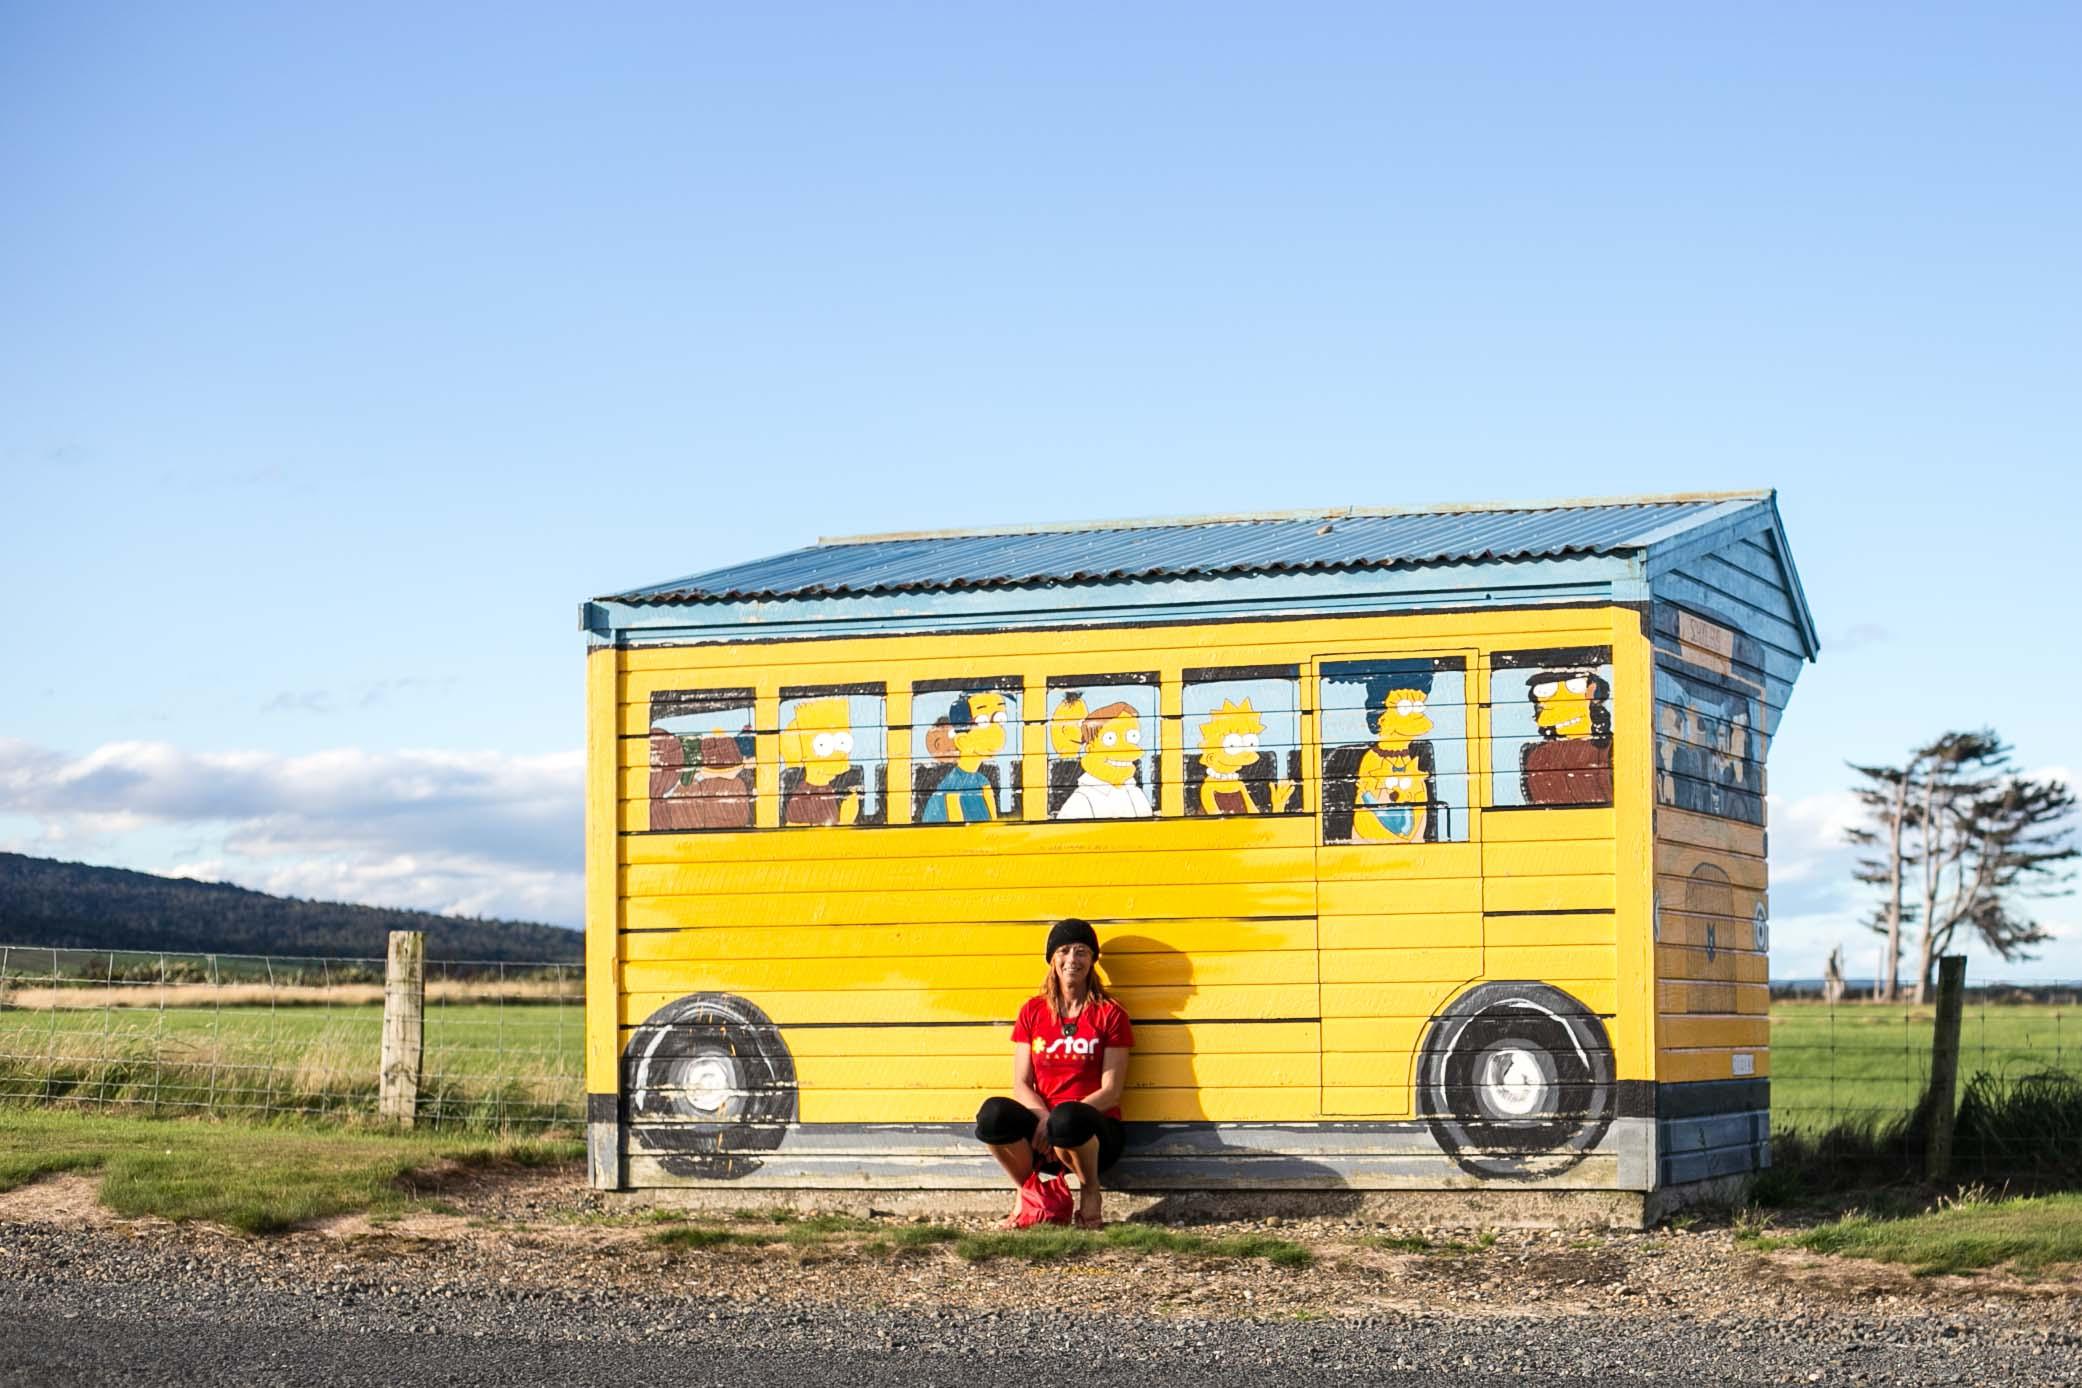 Simpsons school bus